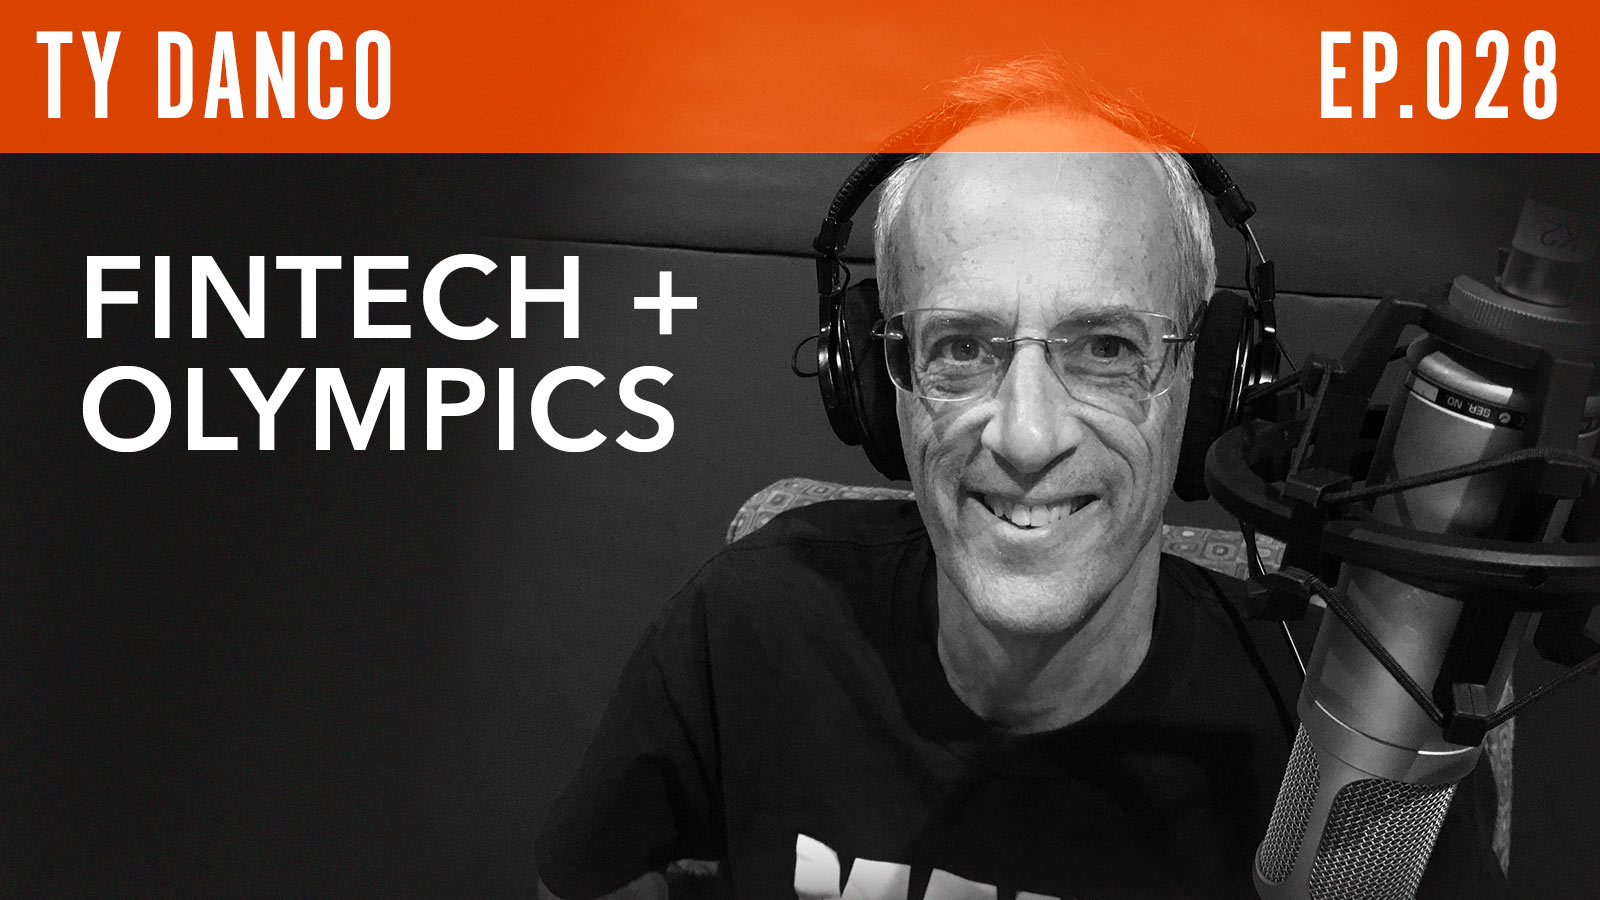 Ty Danco  FinTech + Olympics